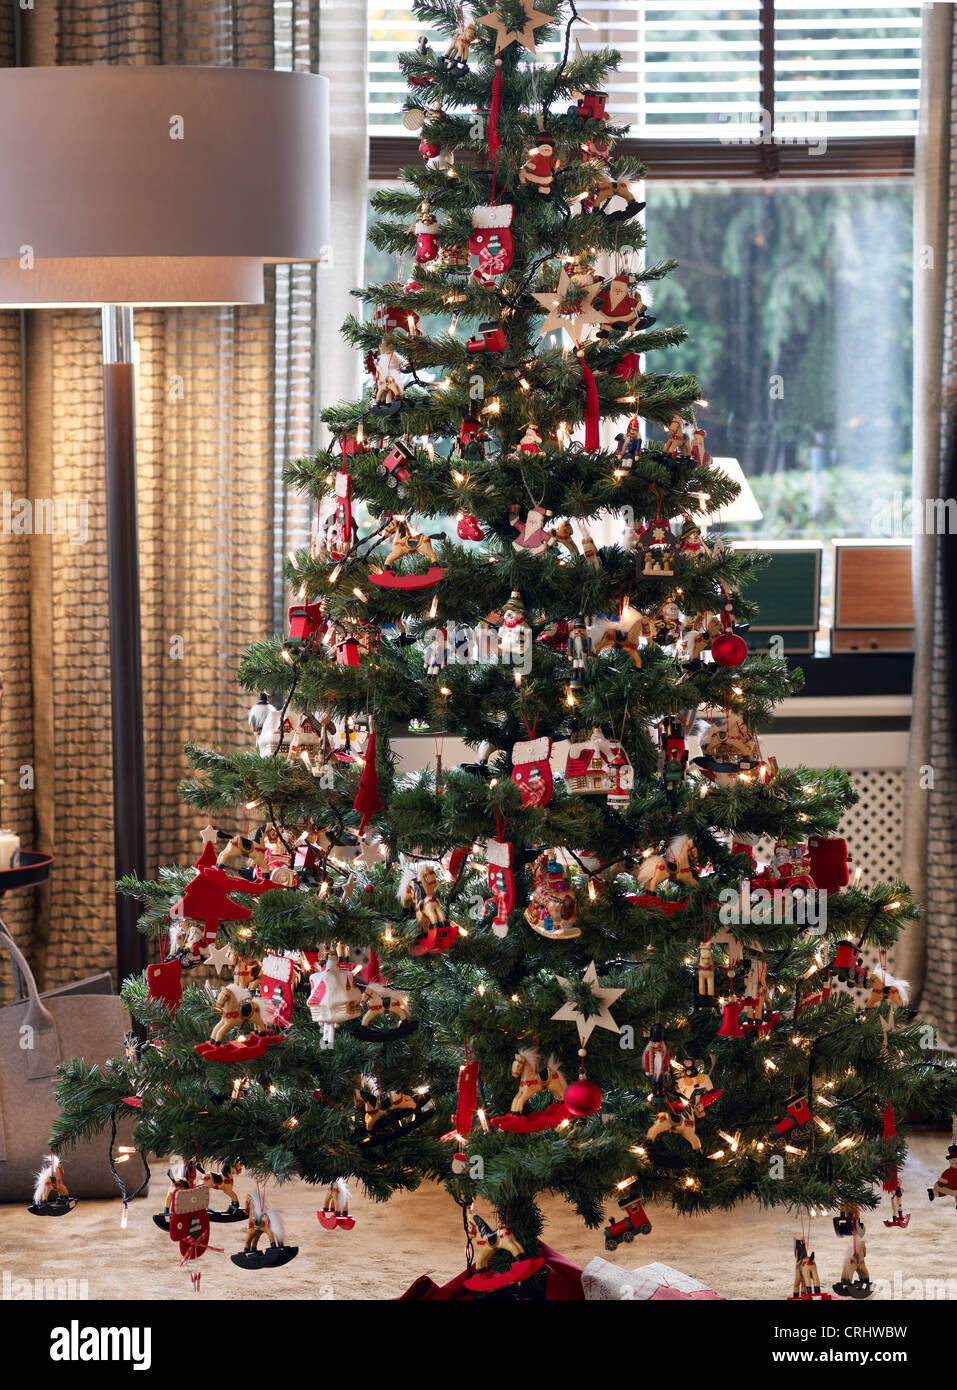 German Christmas Tree.German Christmas Tree Stock Photos German Christmas Tree